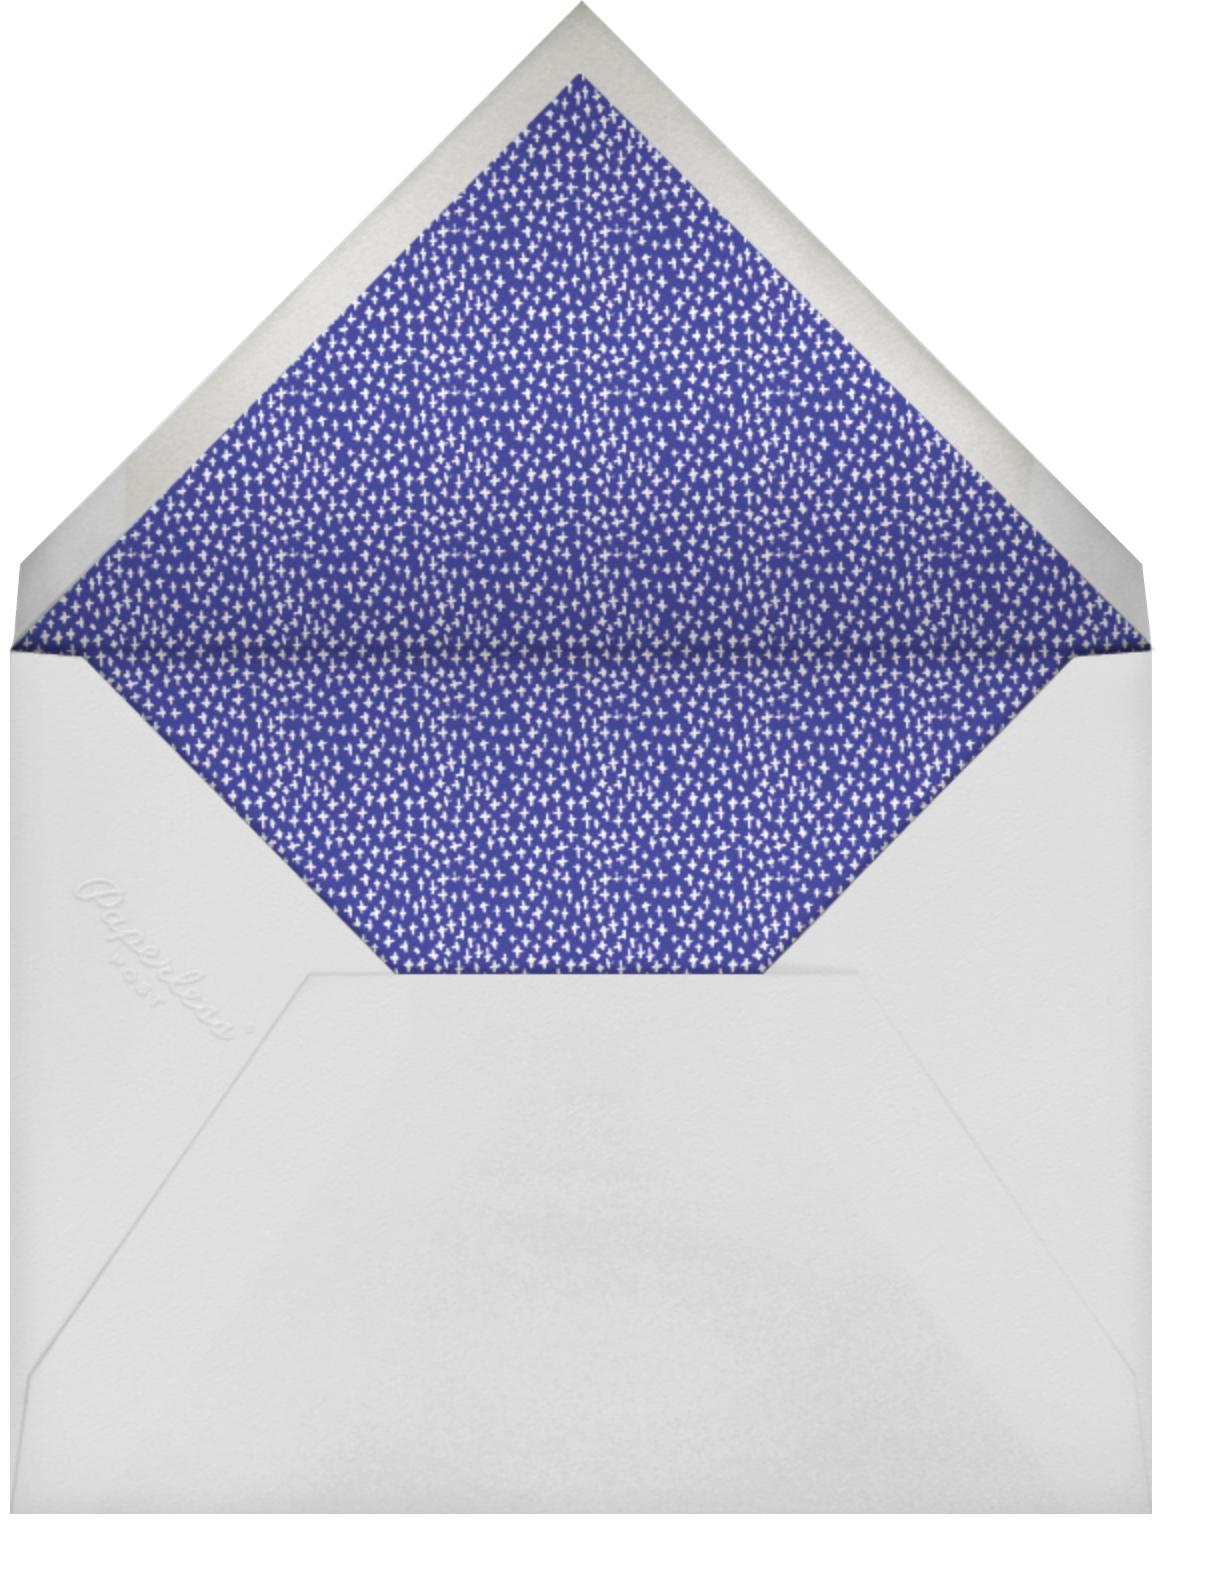 One to Remember - Pink - Mr. Boddington's Studio - 1st birthday - envelope back